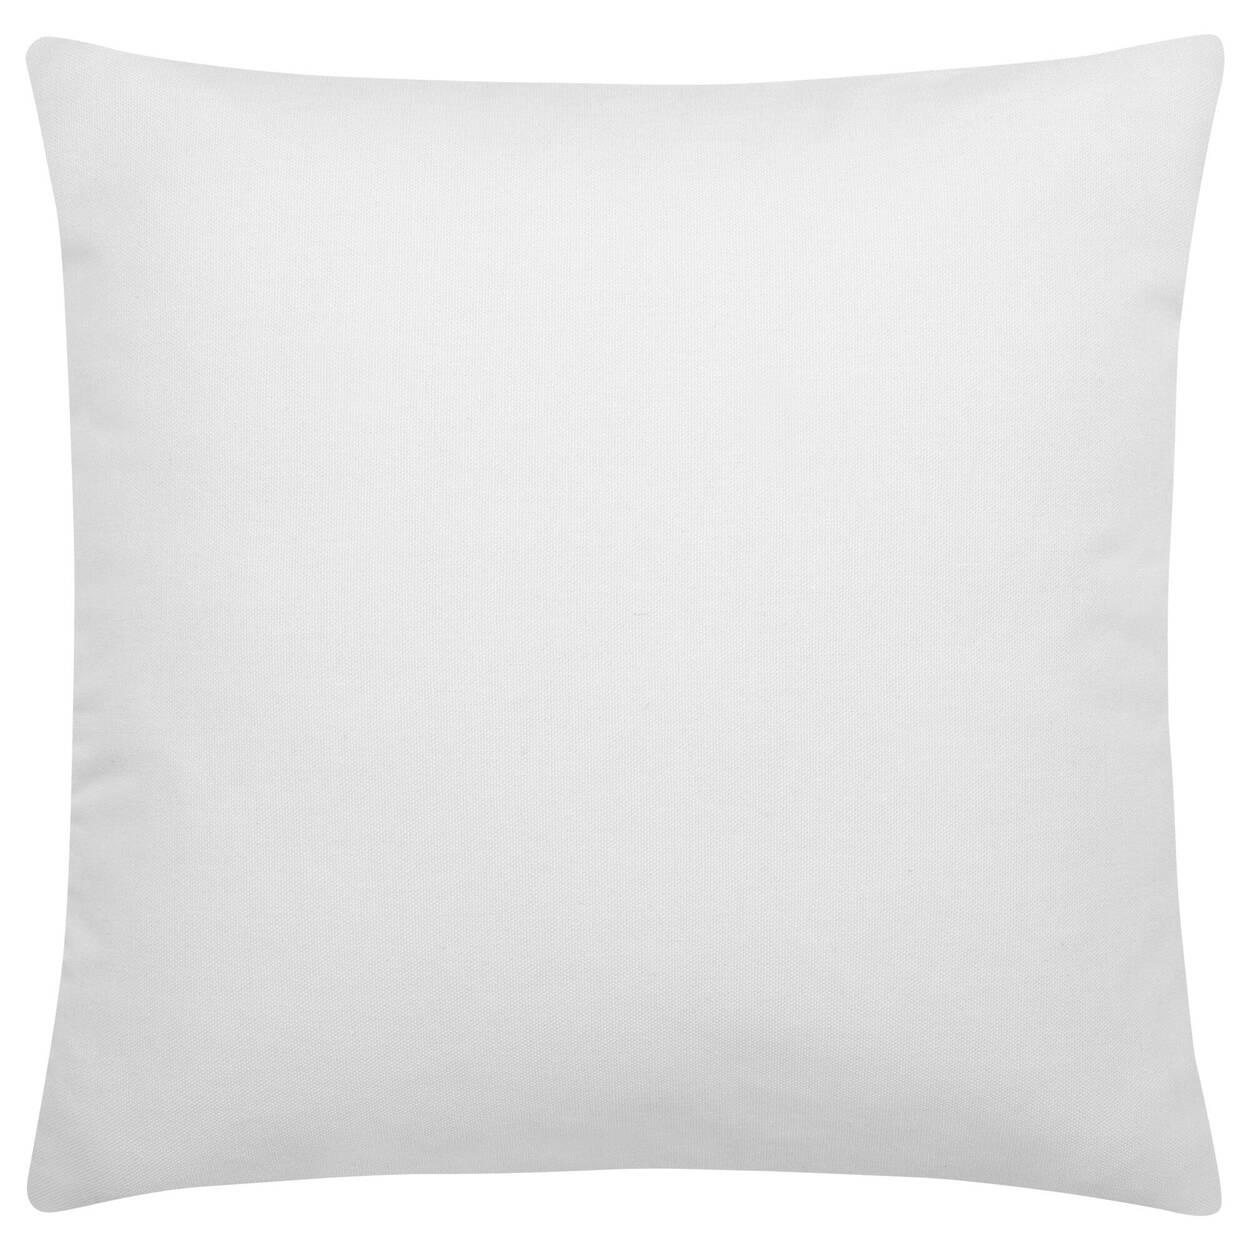 "Pineapples Water-Repellent Decorative Pillow 18"" X 18"""